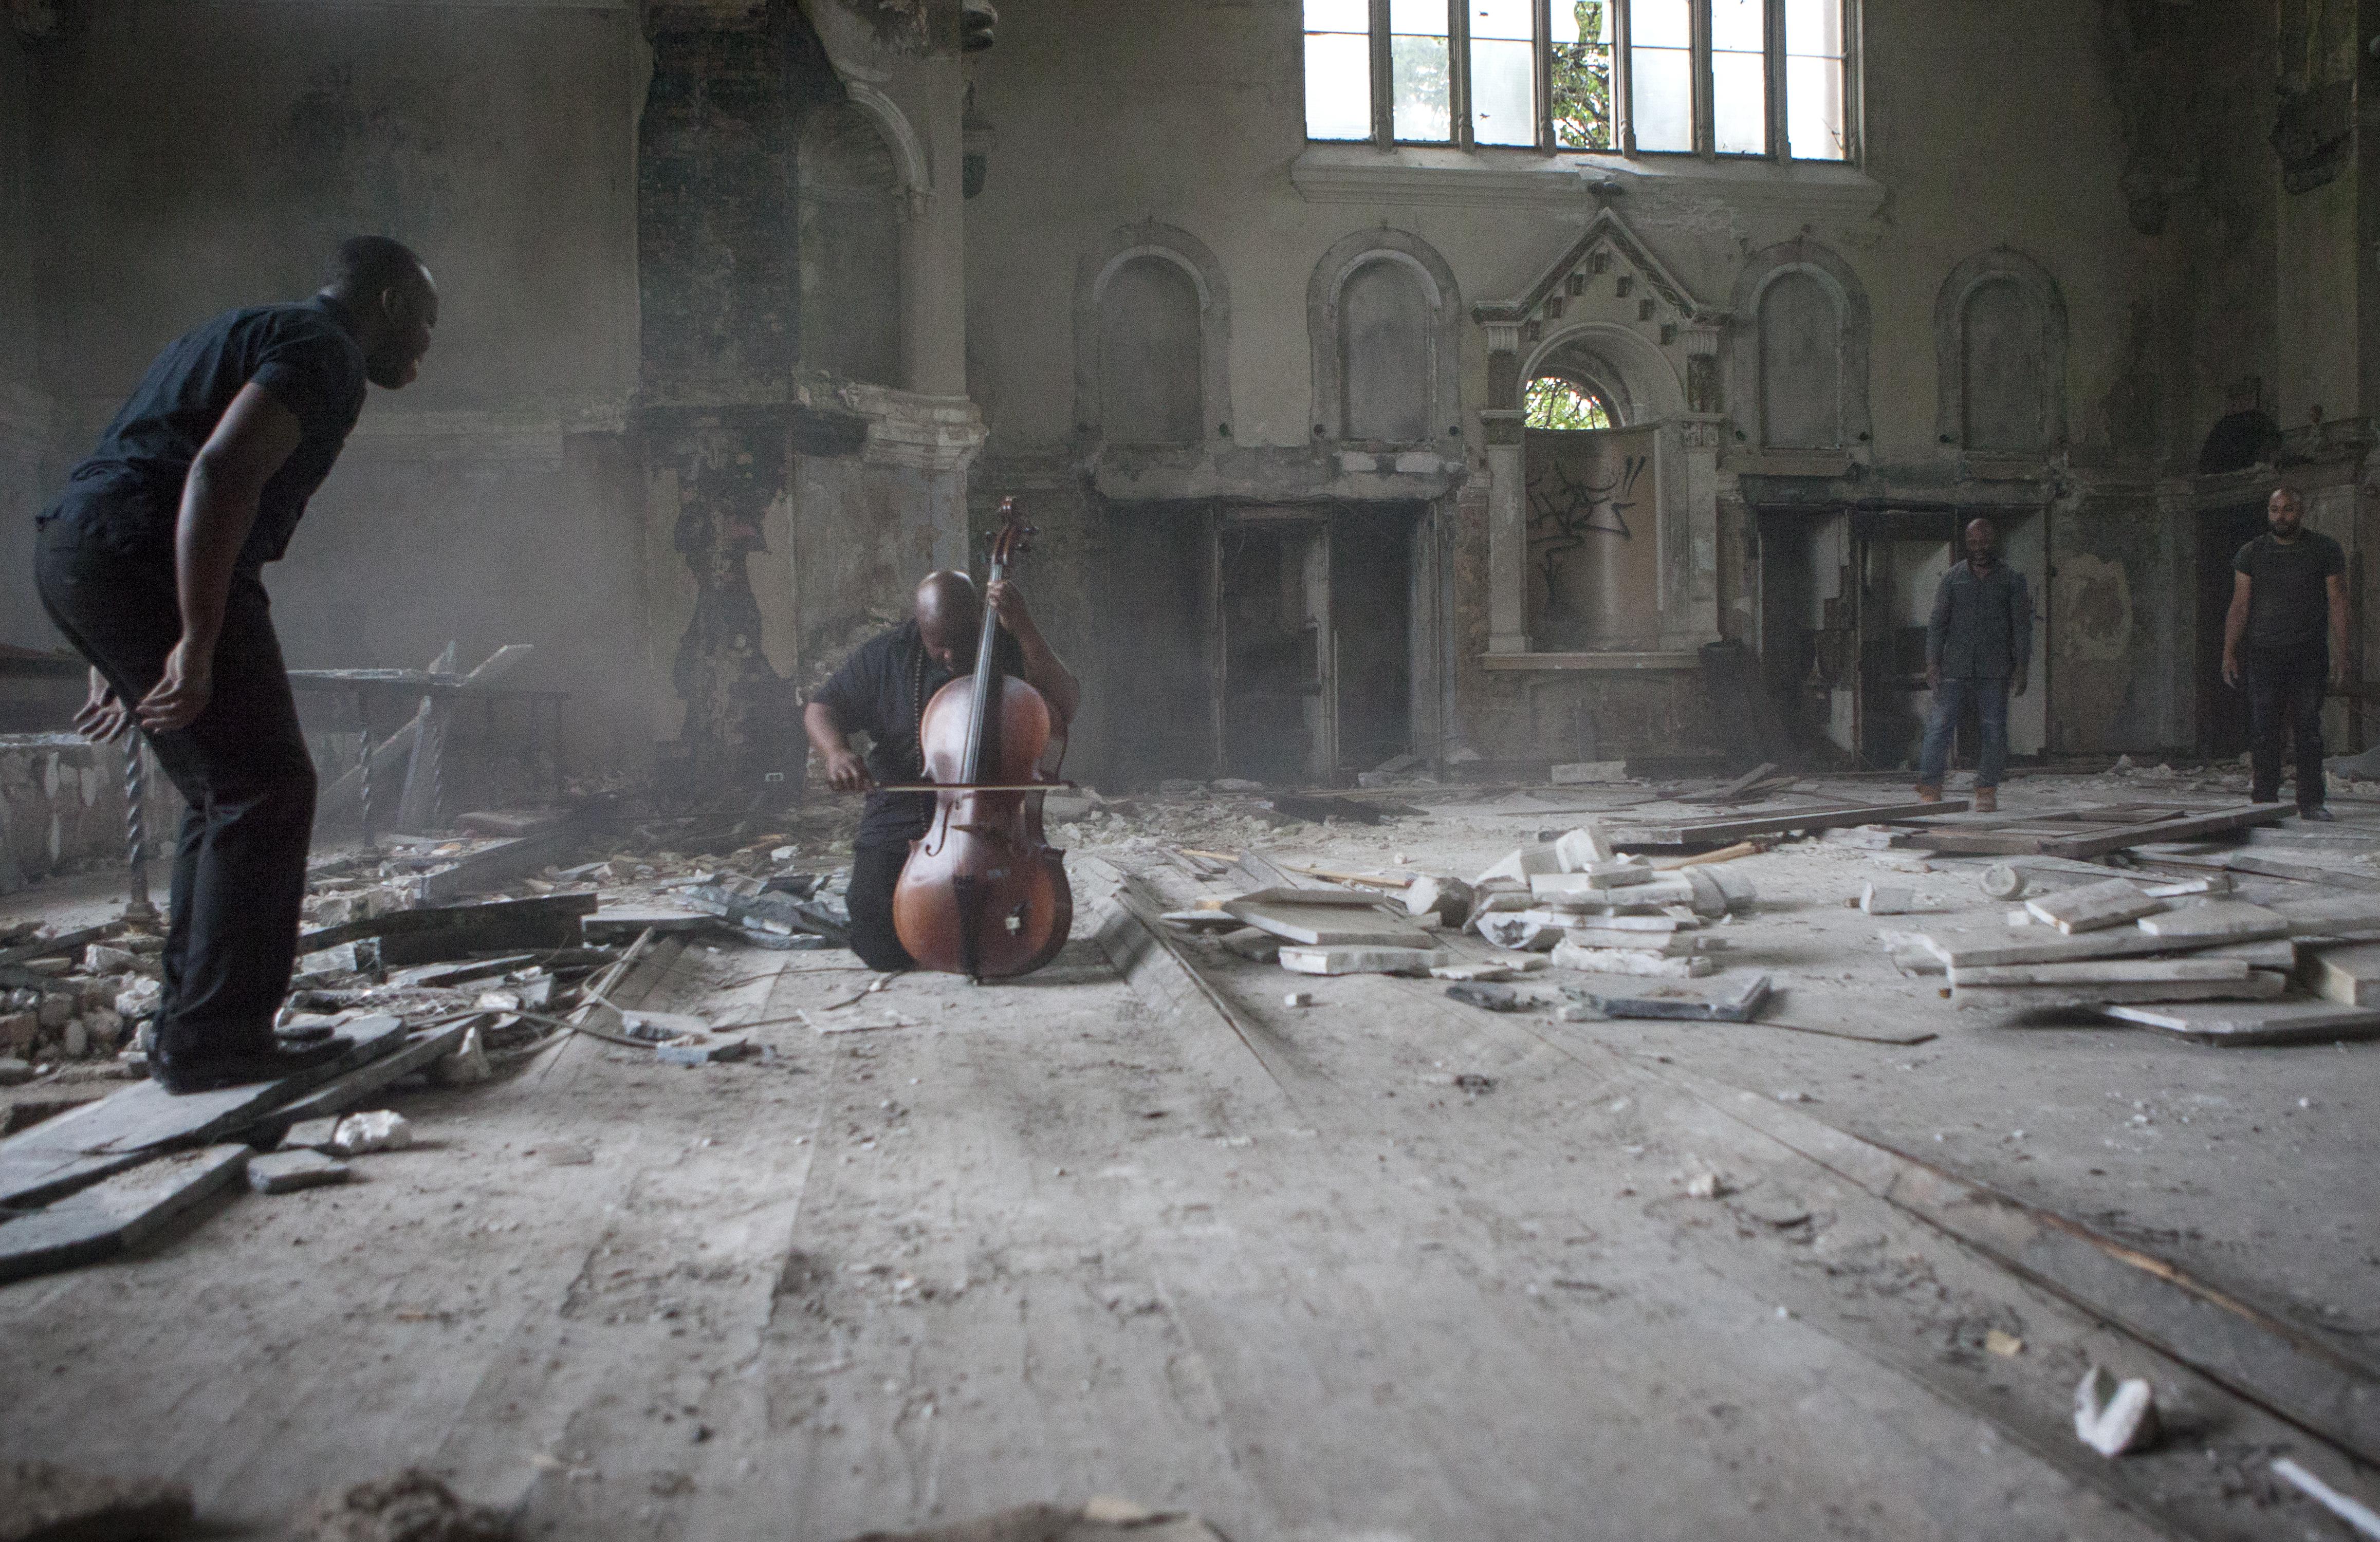 Urban Musical Improvisations